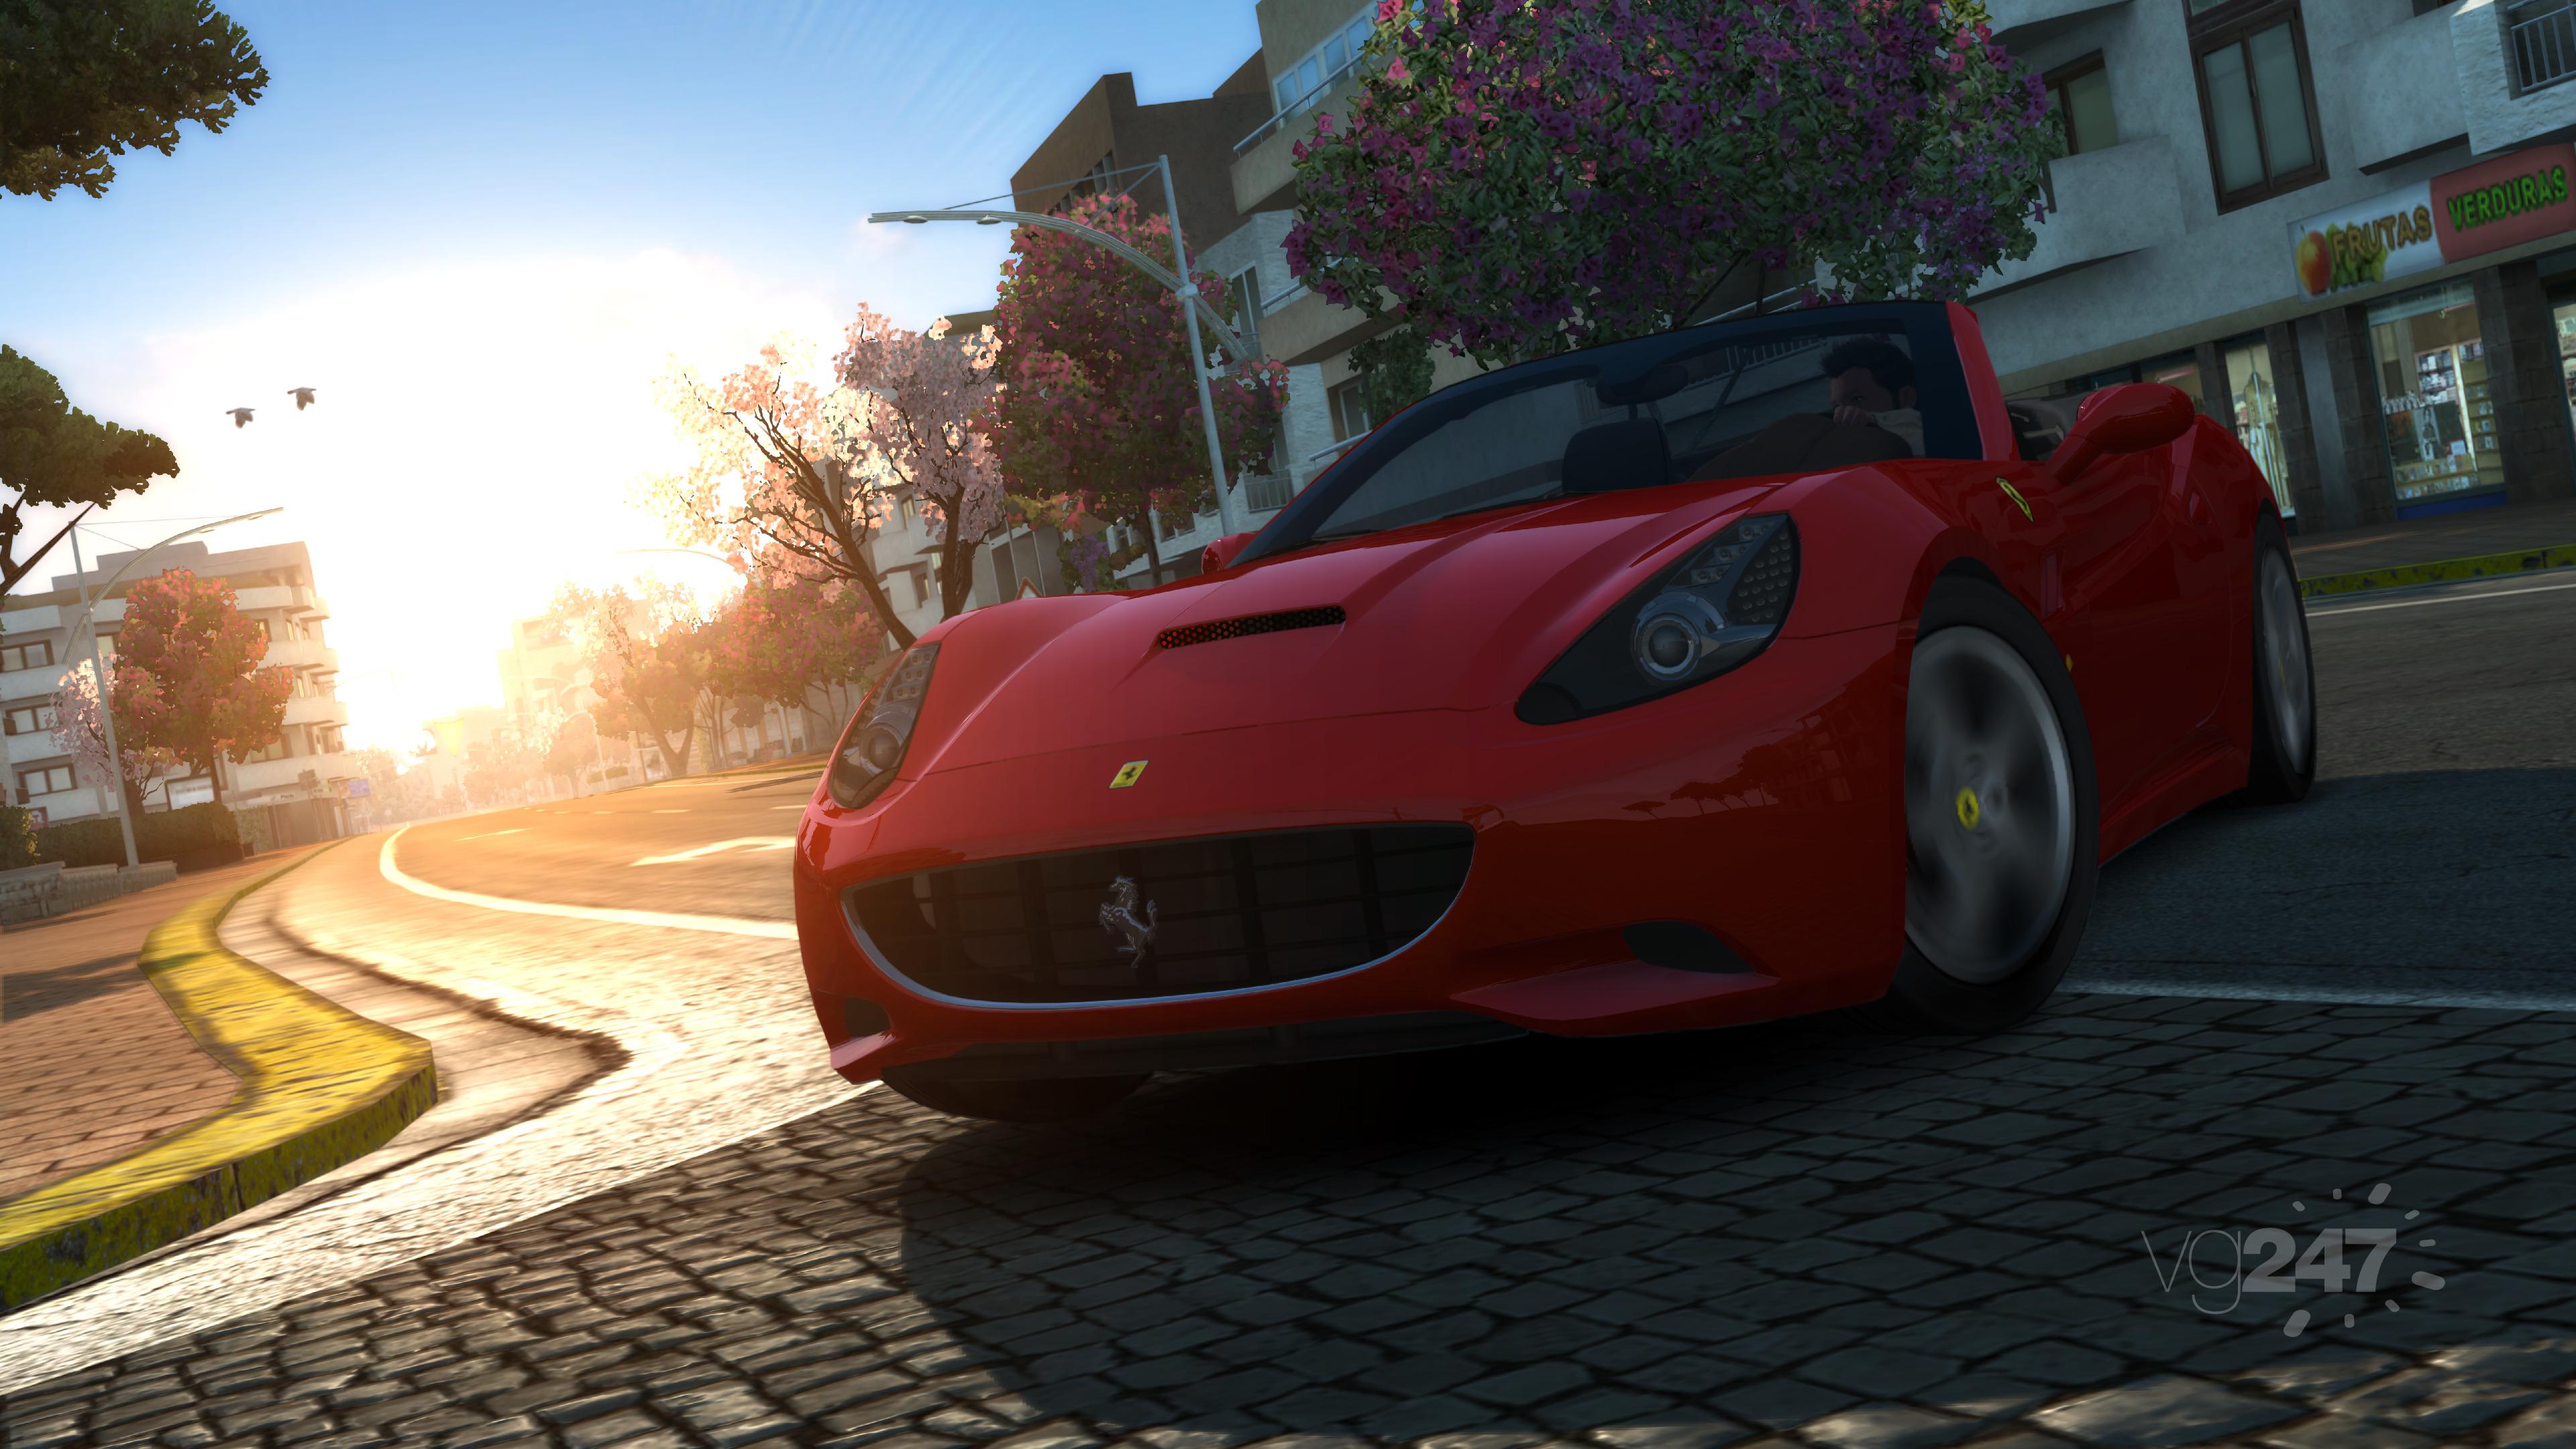 Патч для Test Drive Unlimited 2 появится через 2 недели. Gamebomb.ru